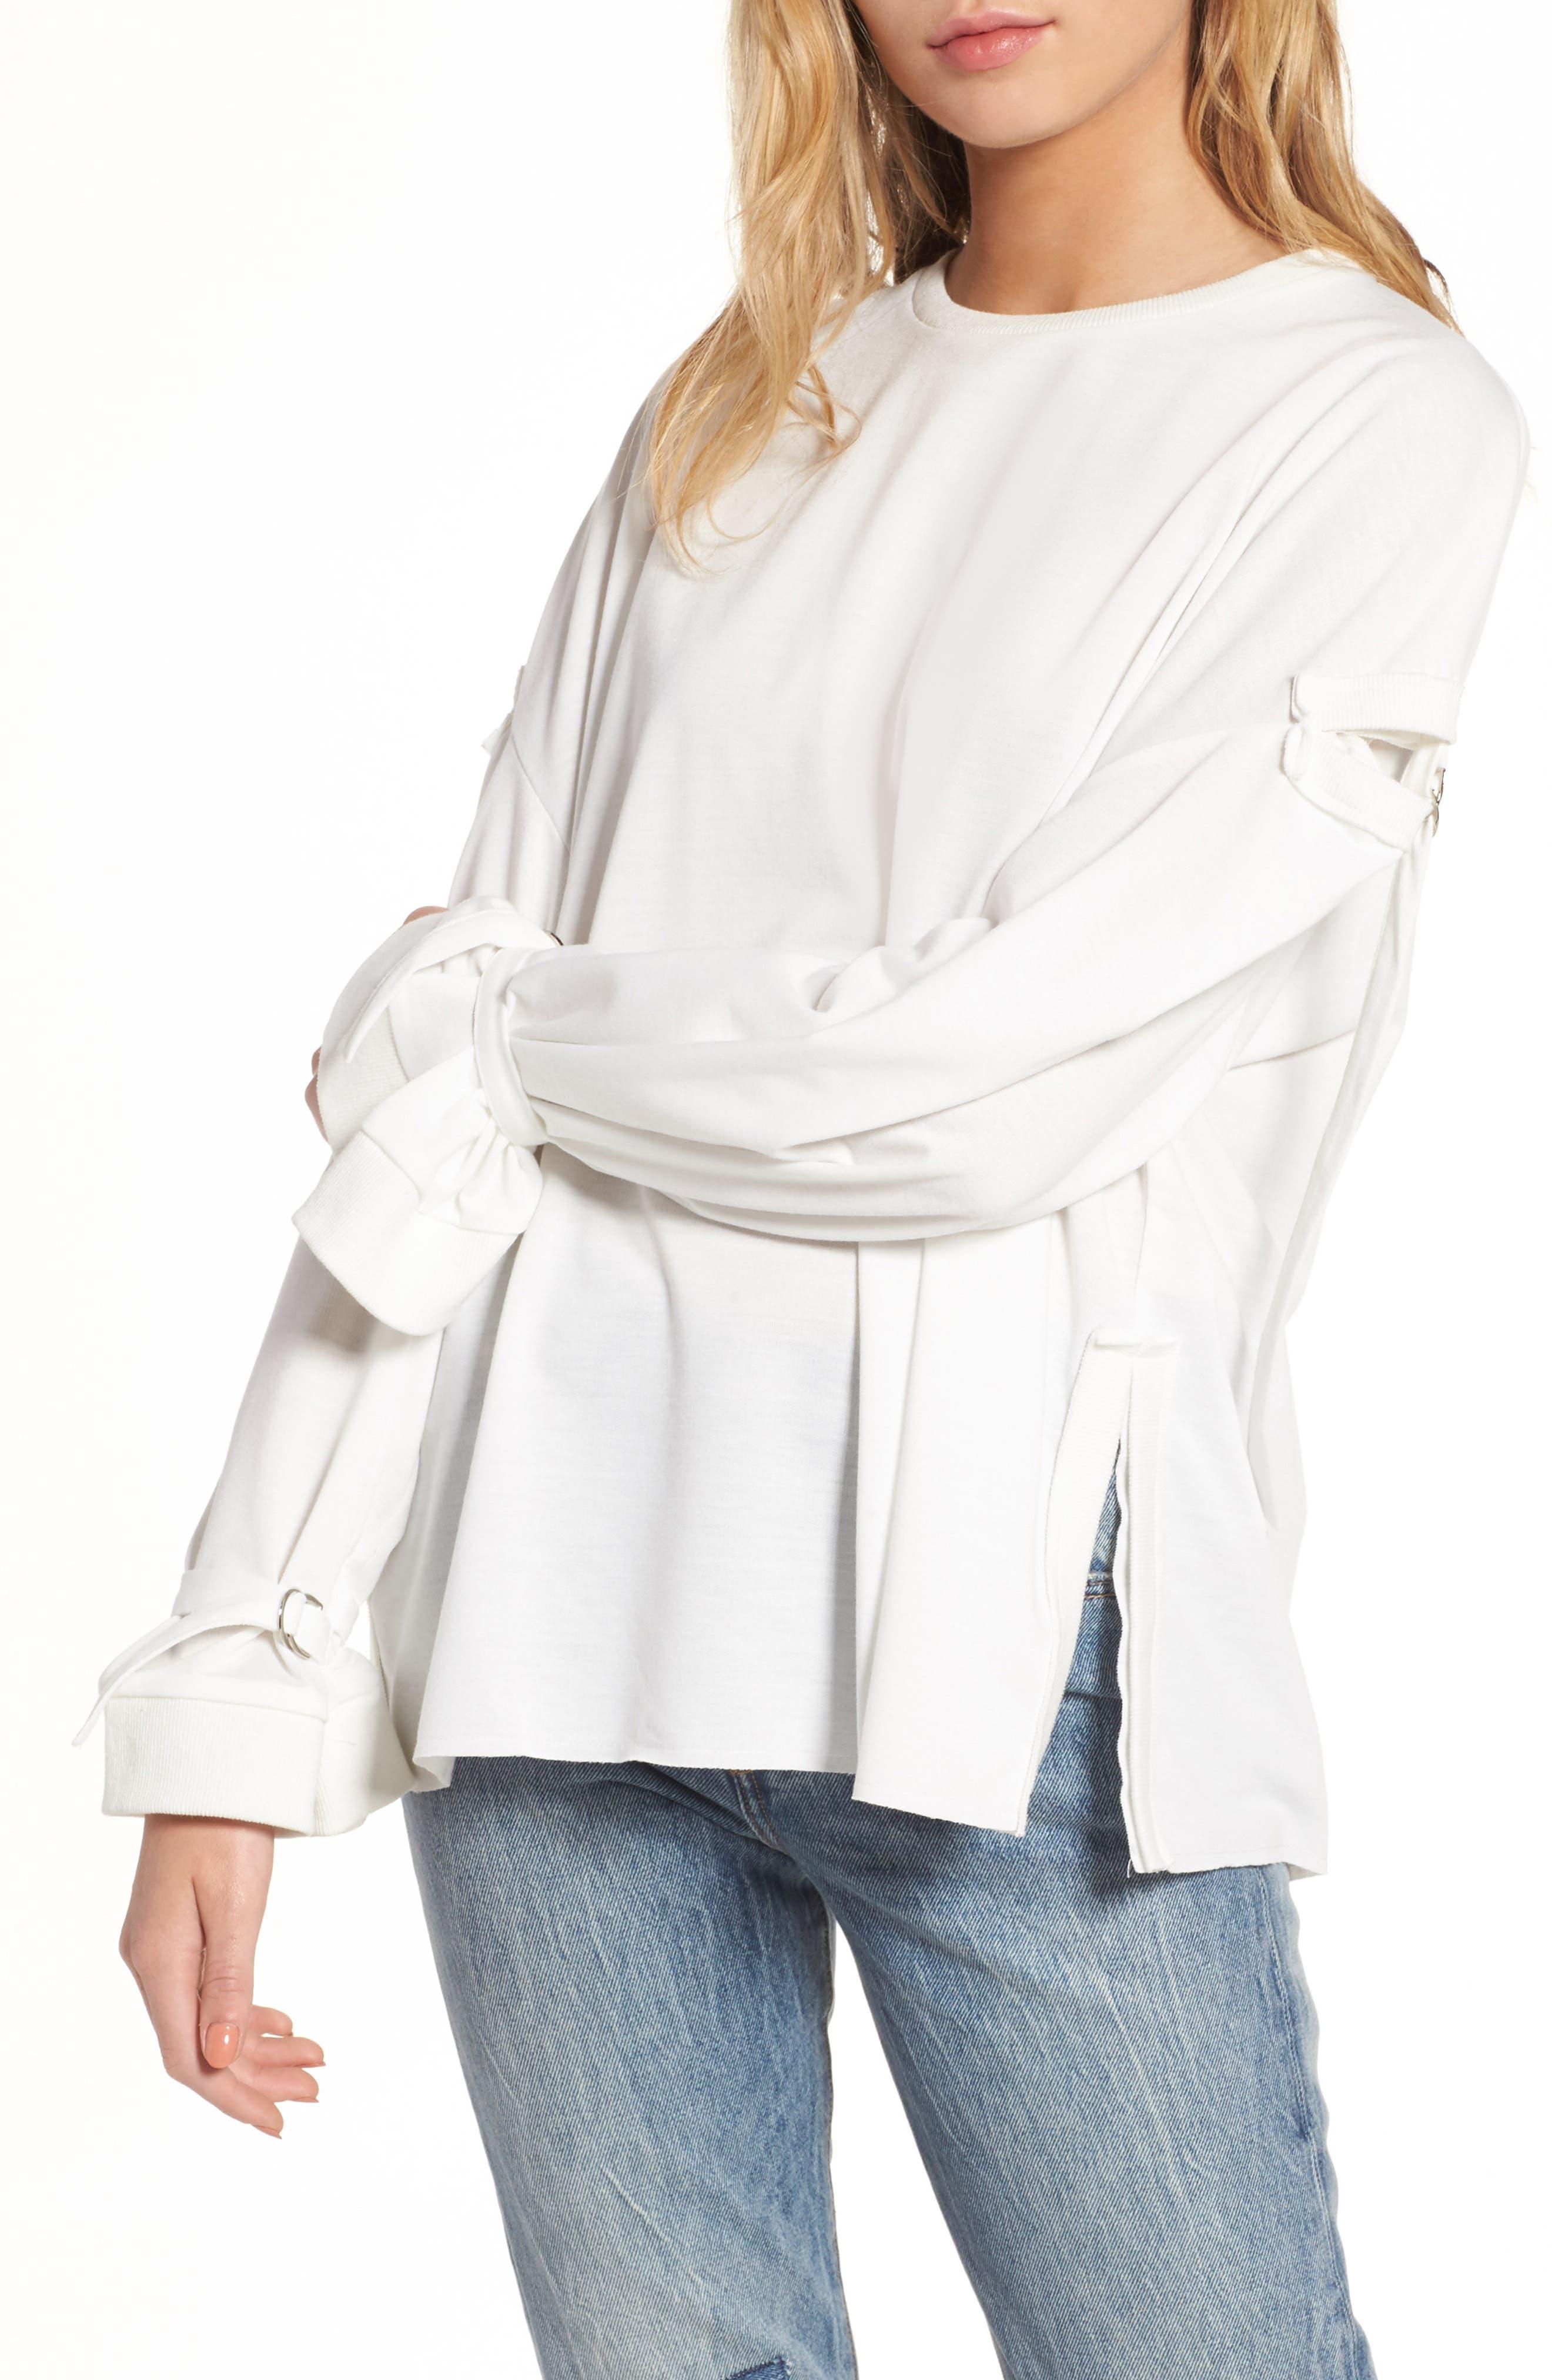 Cutout Detail Sweatshirt,                             Main thumbnail 1, color,                             White